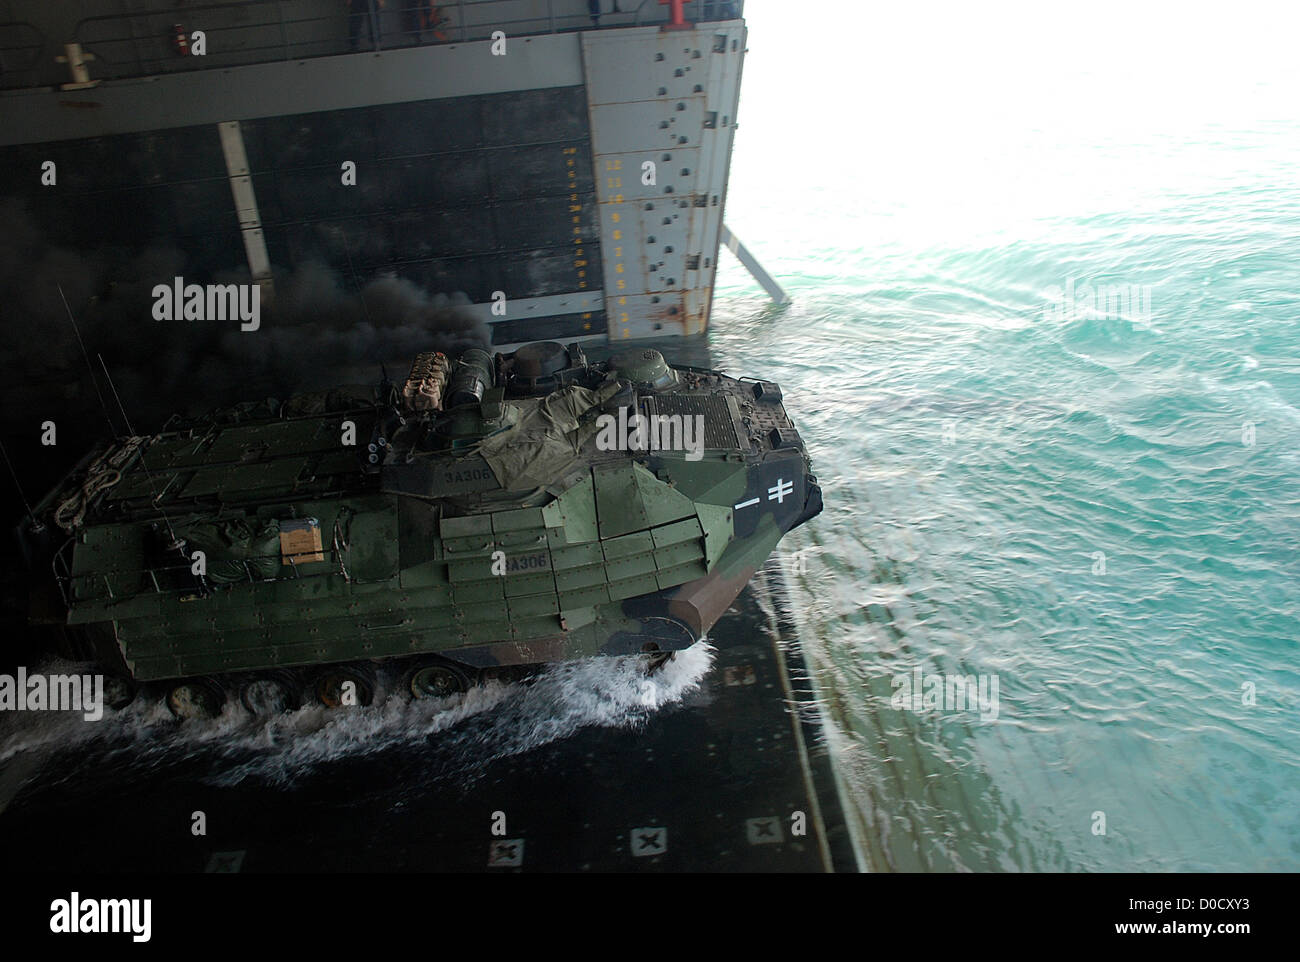 An amphibious assault vehicle (AAV) departs the amphibious transport dock ship USS Green Bay (LPD 20) during a routine Stock Photo